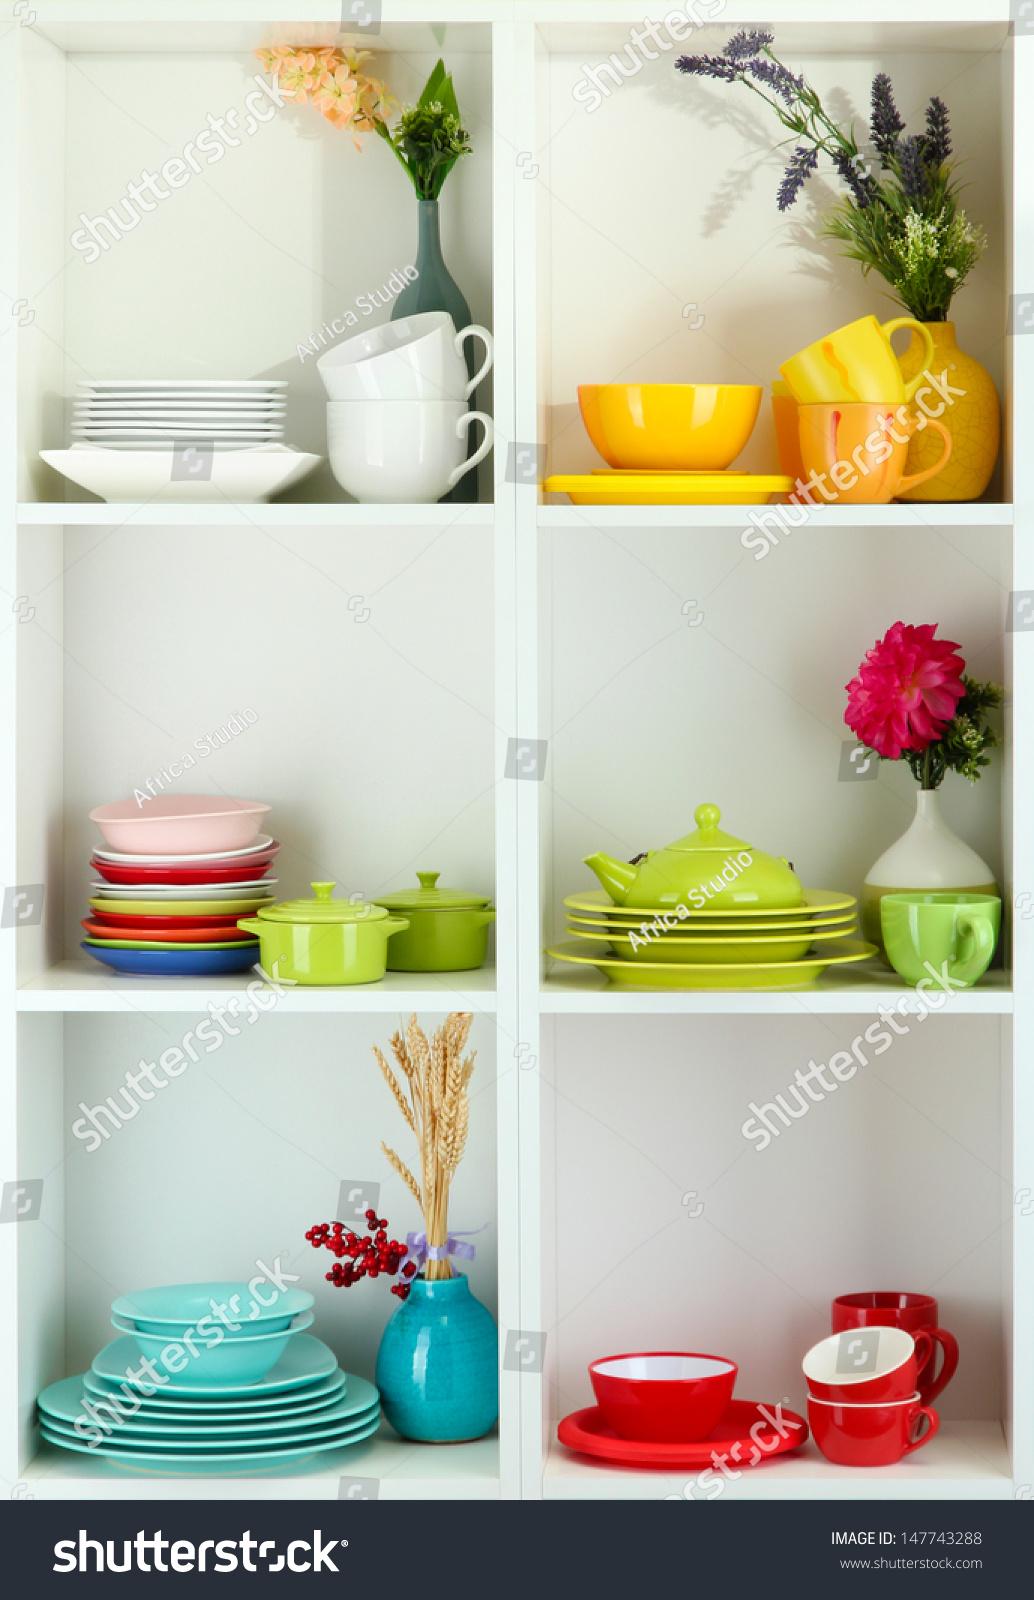 Beautiful white shelves with tableware and decor stock photo 147743288 shutterstock - Beautiful photoshelves ...